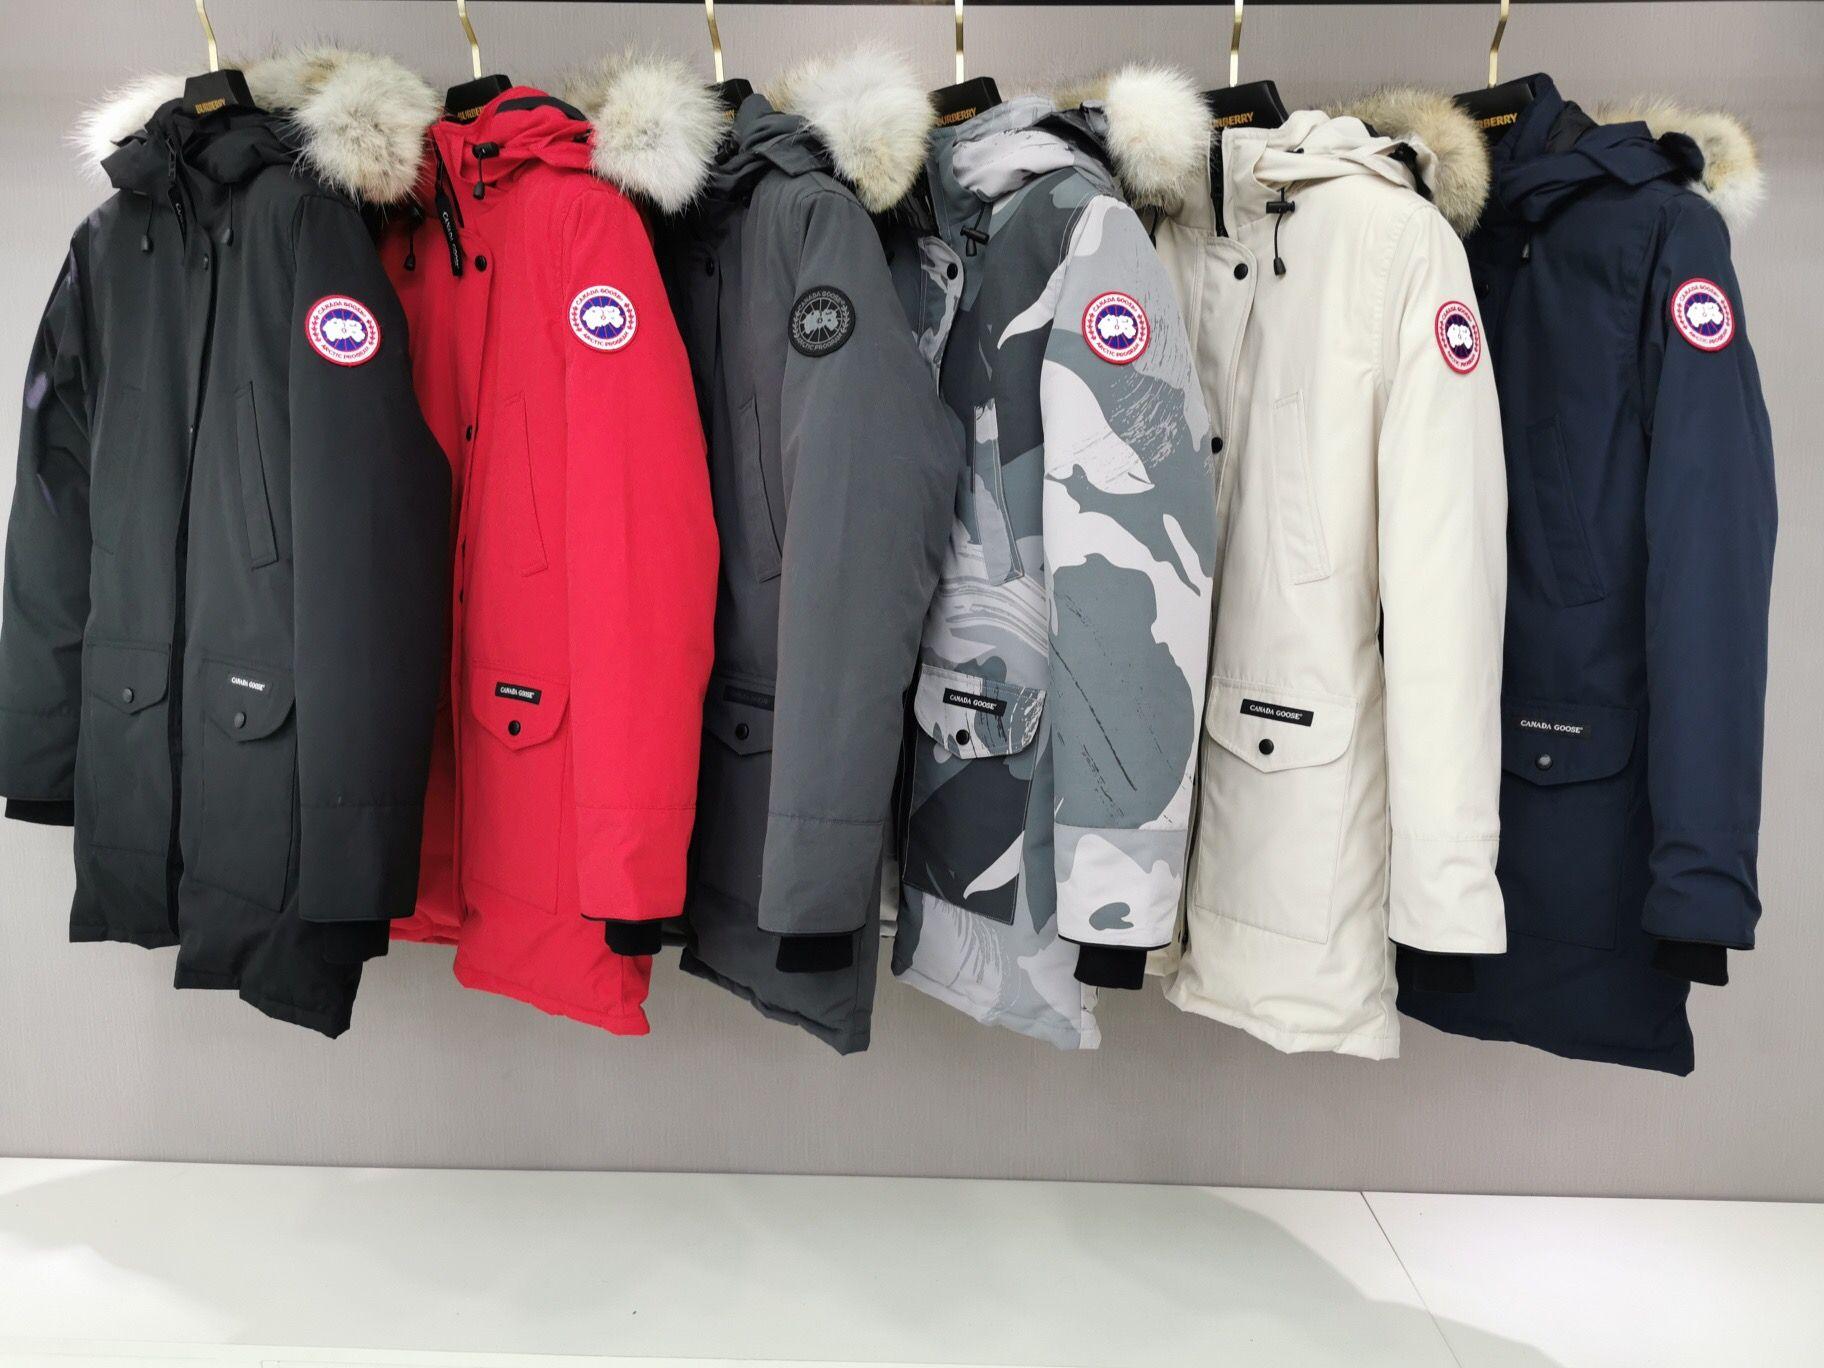 Canada Goose 07 Trillium For Women 6 Colors Luxury Jacket Jackets Canada Goose Parka